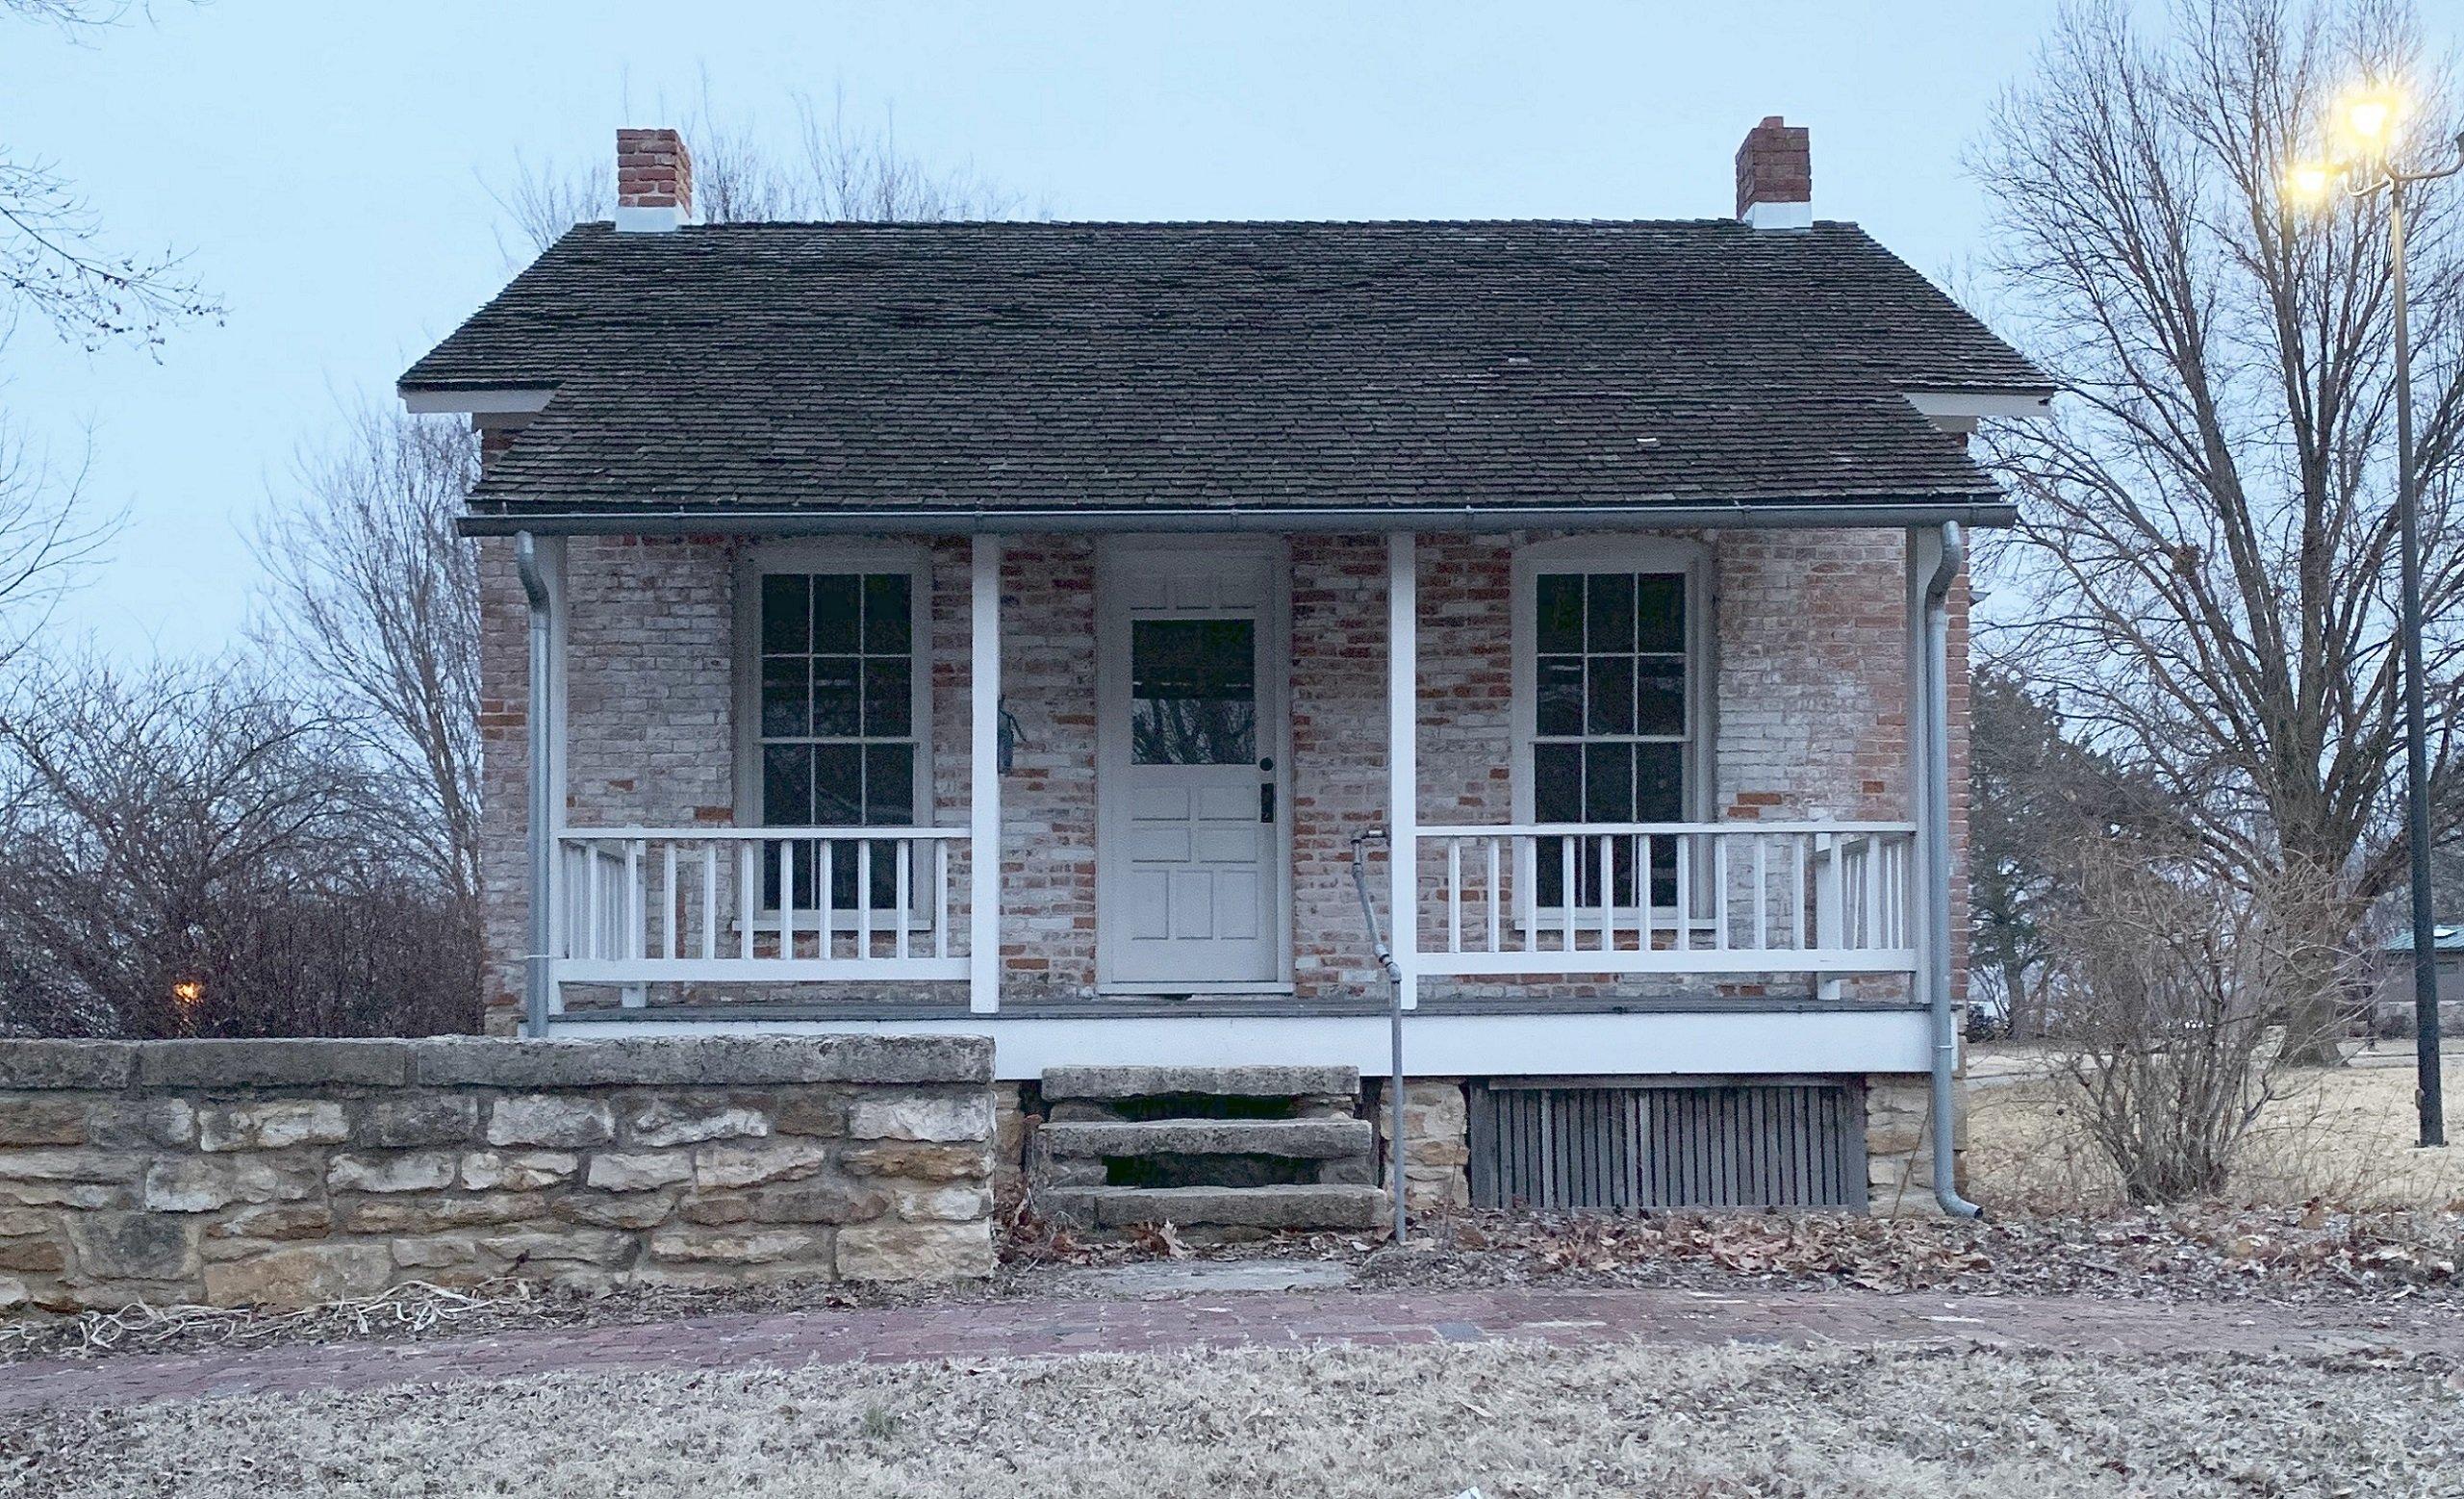 The street view of John Speer's house.